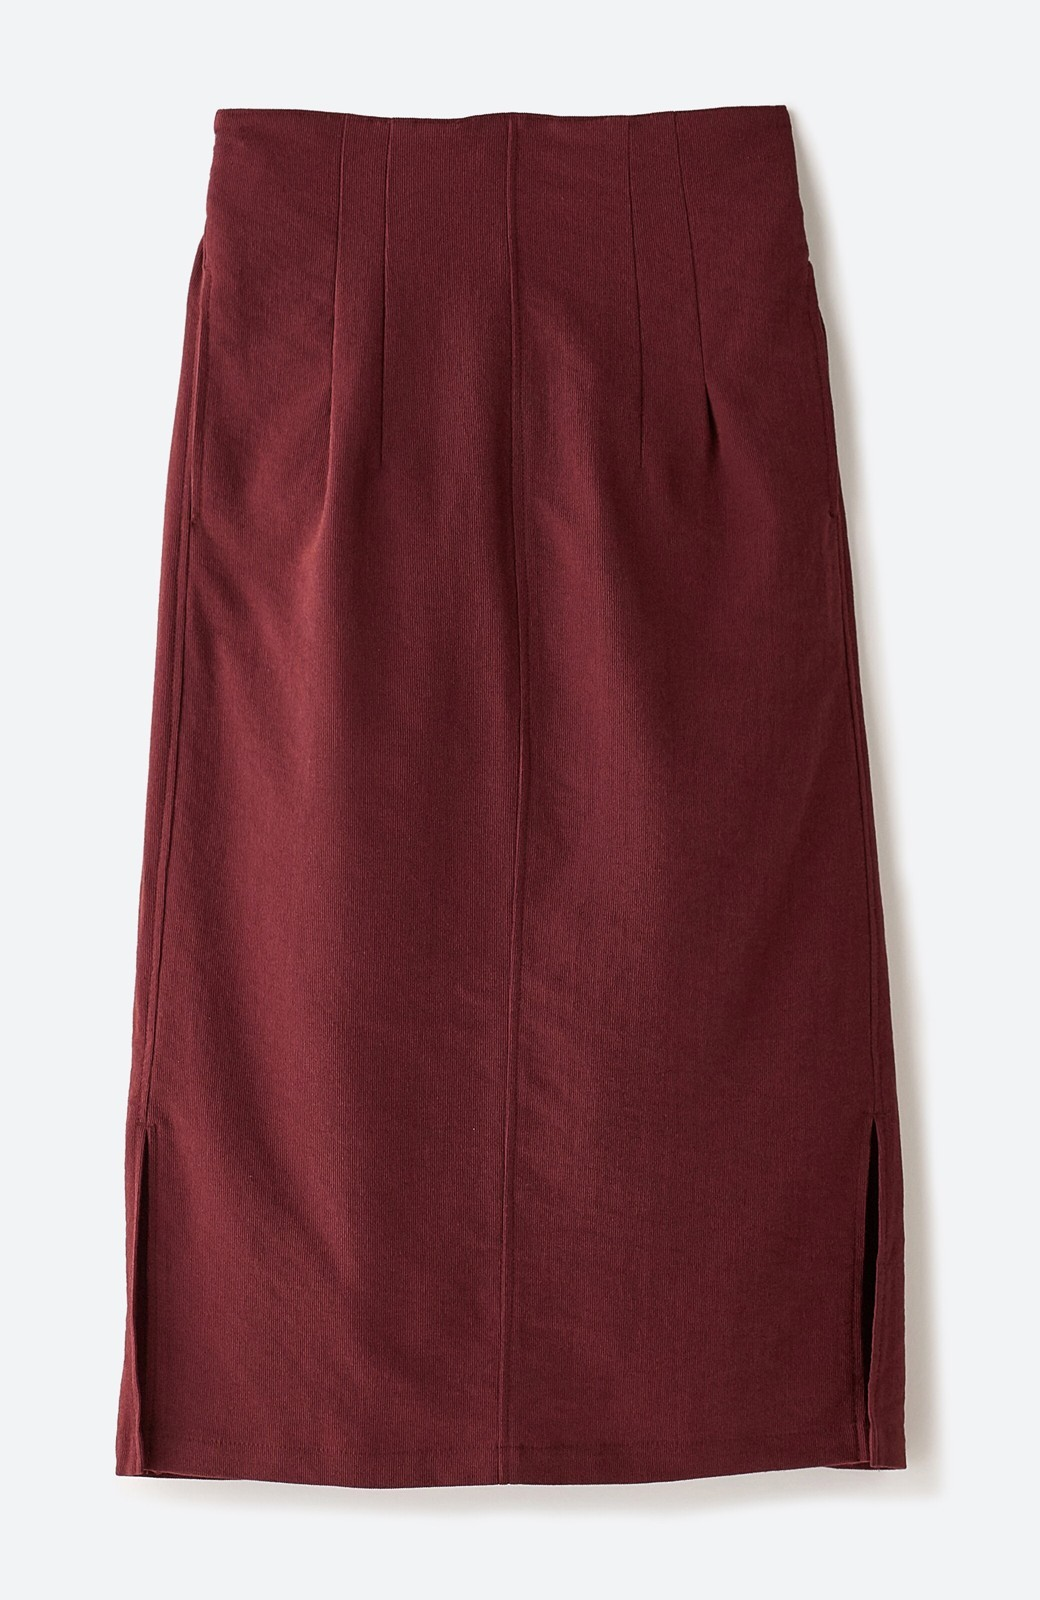 haco!  腹巻きとは呼ばせない ブルー期も華やかに過ごせる消臭加工裏地付きフリルデザインスカートセット【ブルー期】女の子バンザイ!プロジェクト <ボルドー>の商品写真4